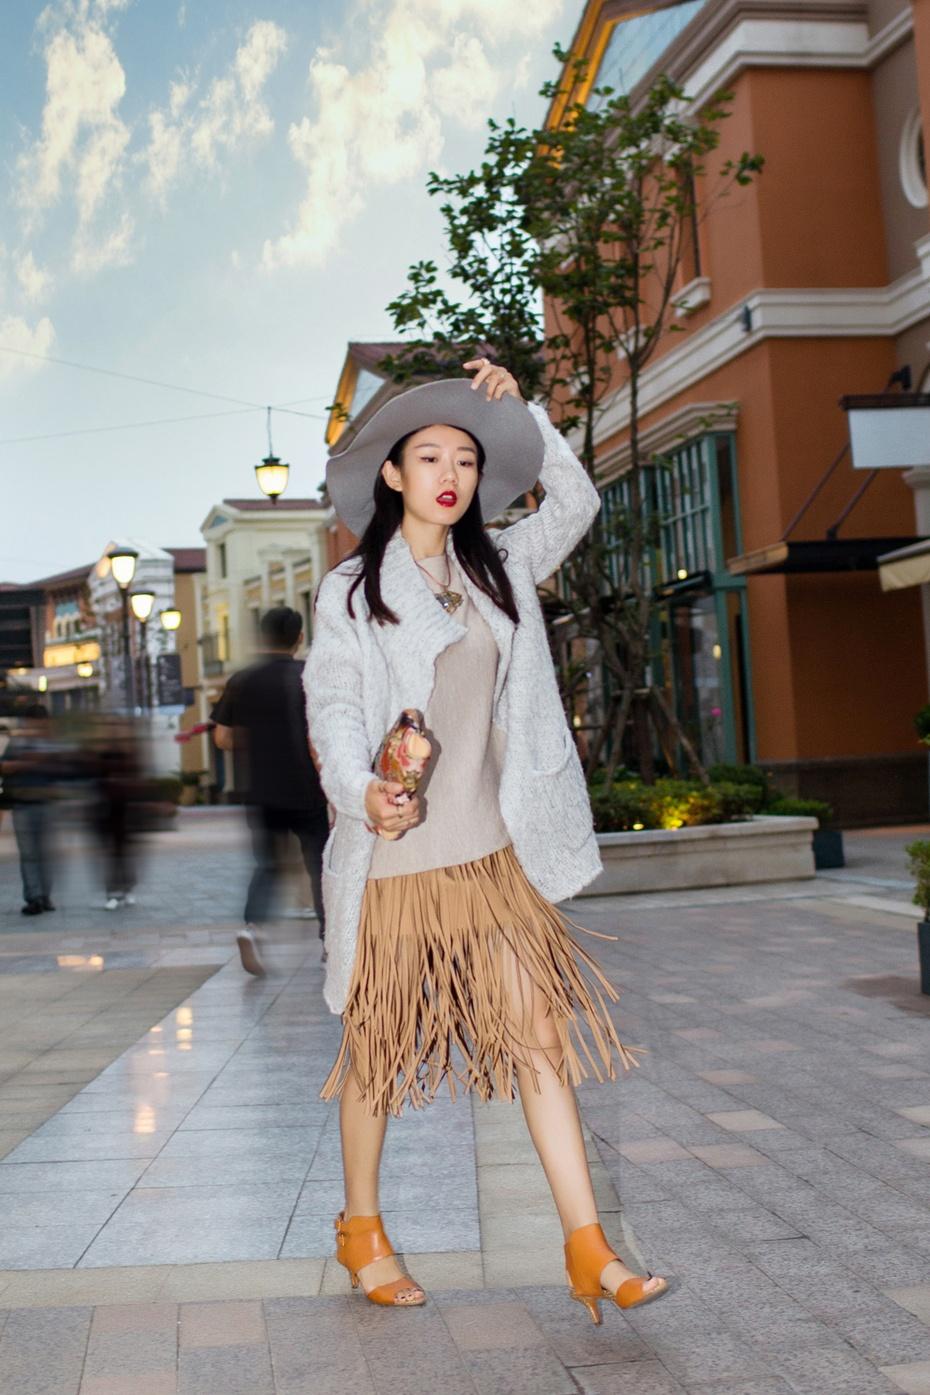 [Ava搭配日记]蝙蝠袖毛衣穿搭术 - AvaFoo - Avas Fashion Blog